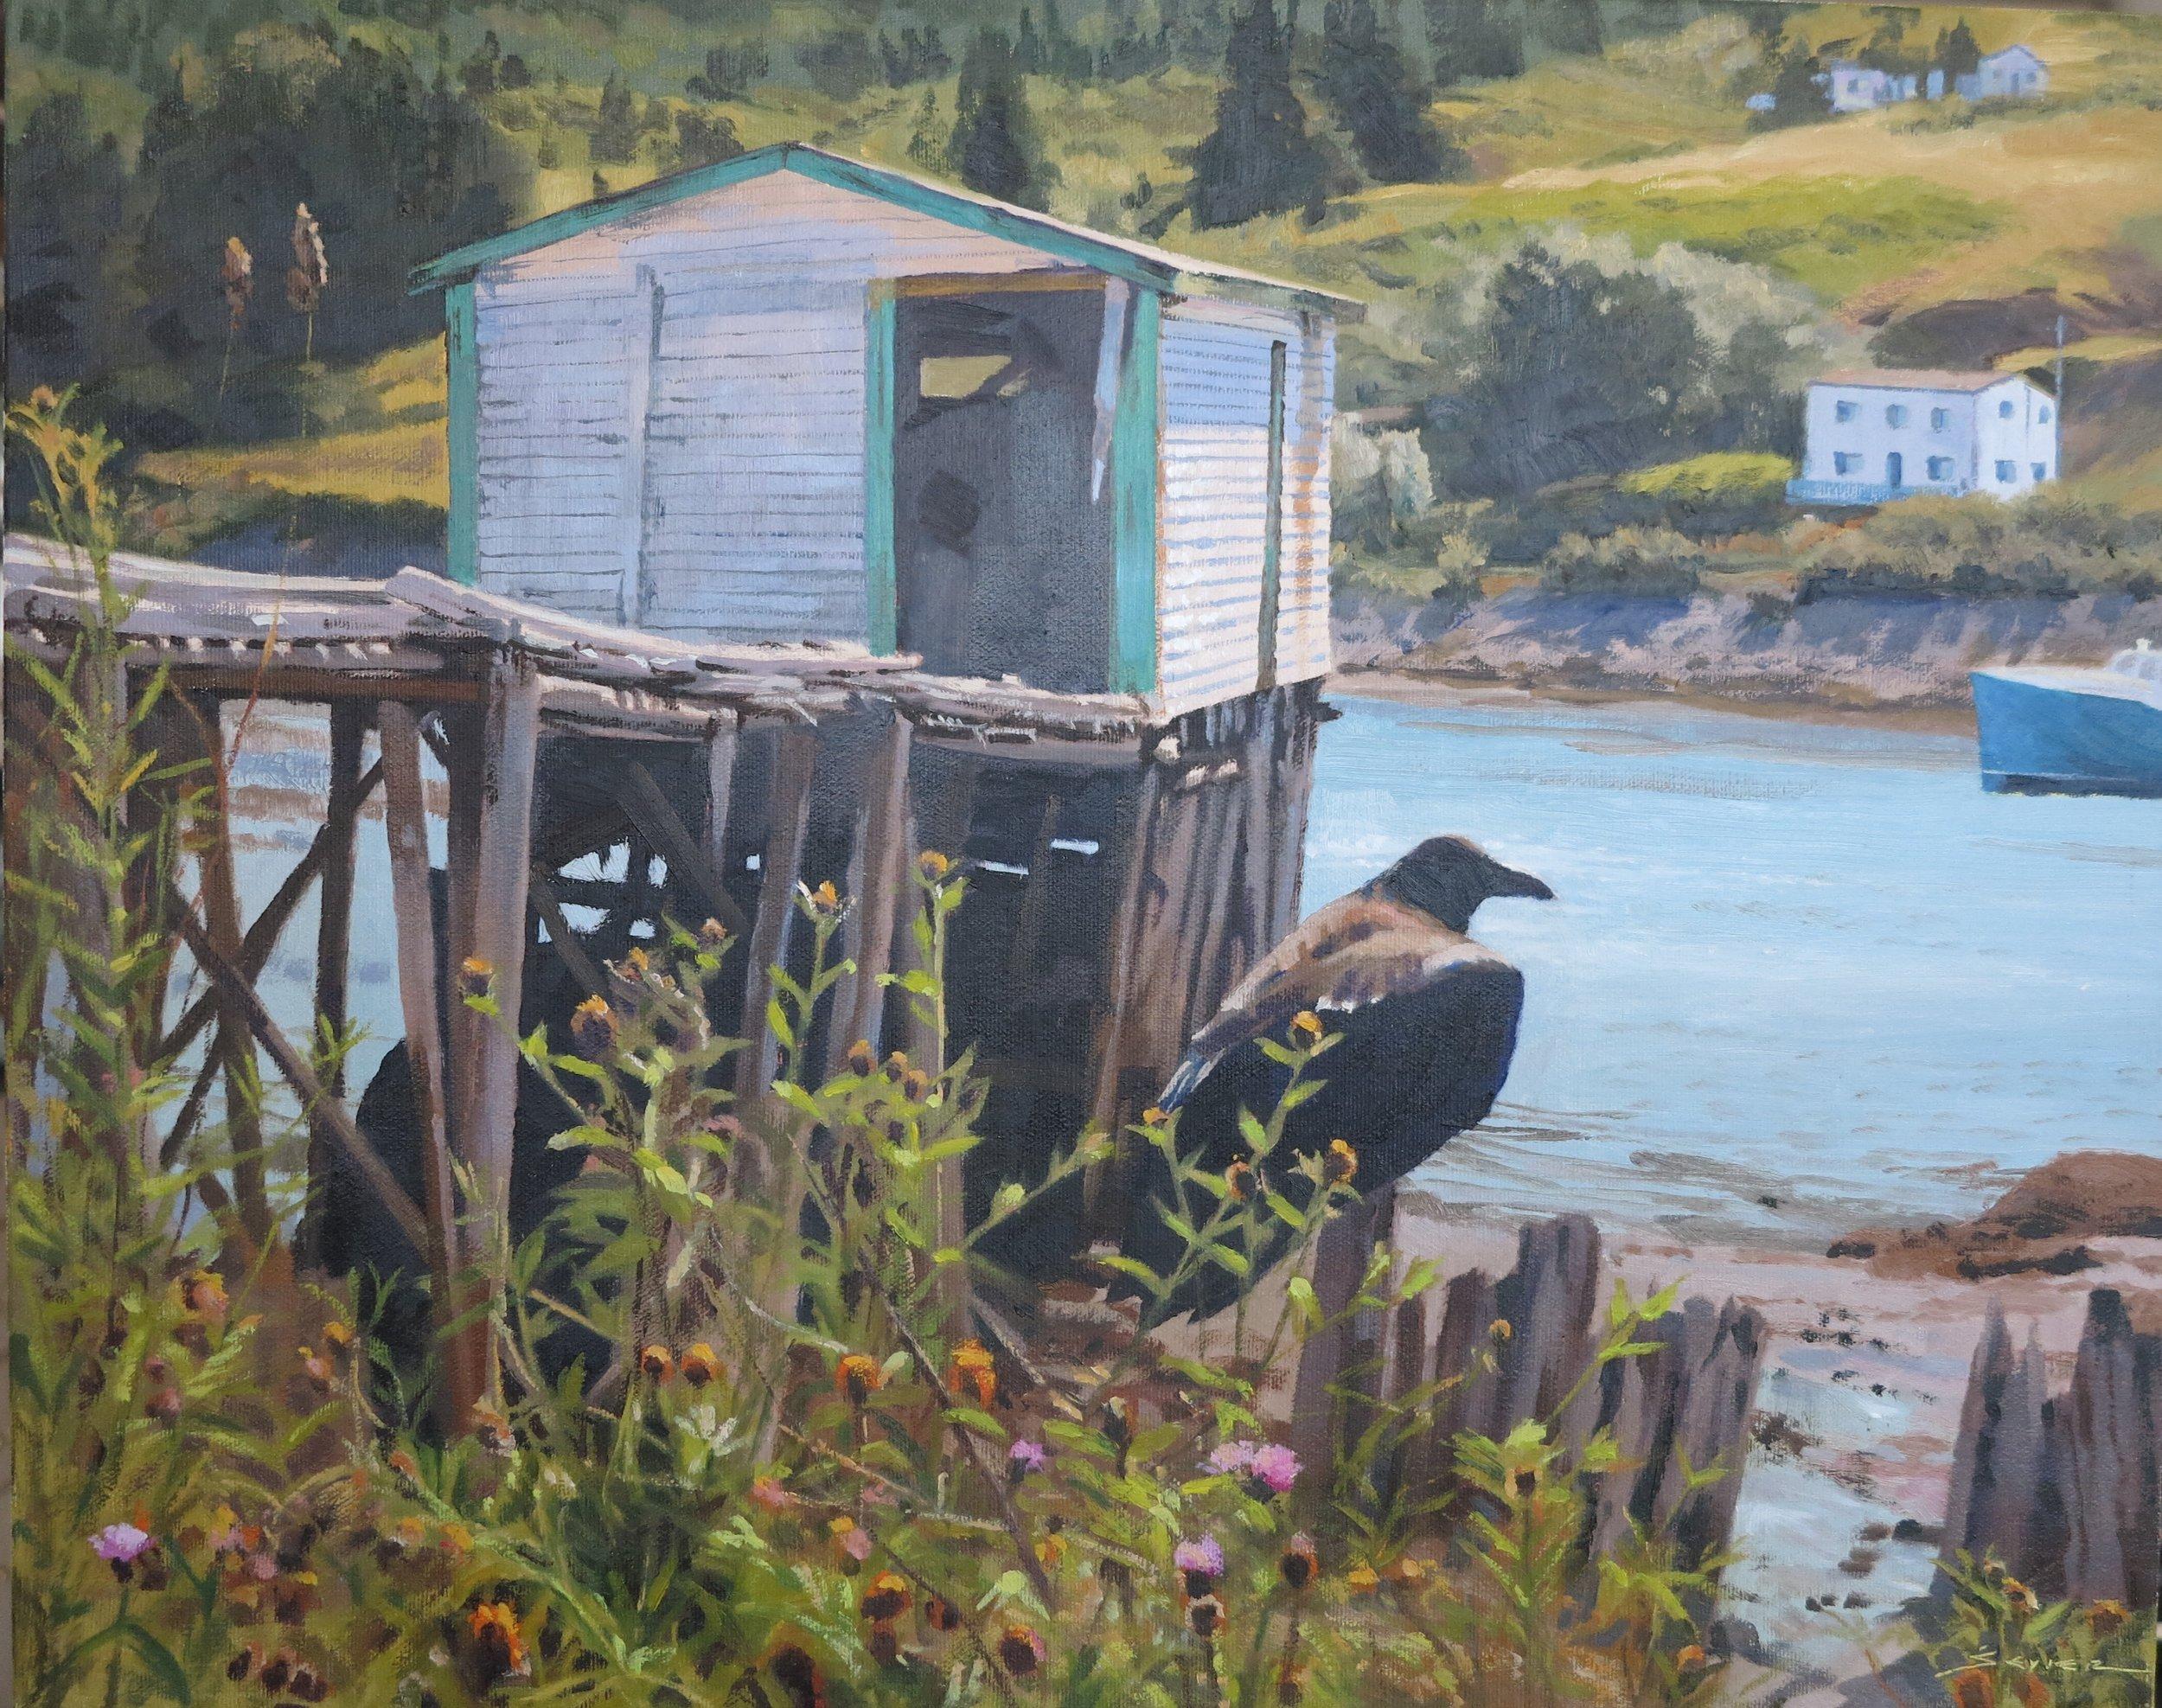 South Brigus Raven, 16 x 20, oil